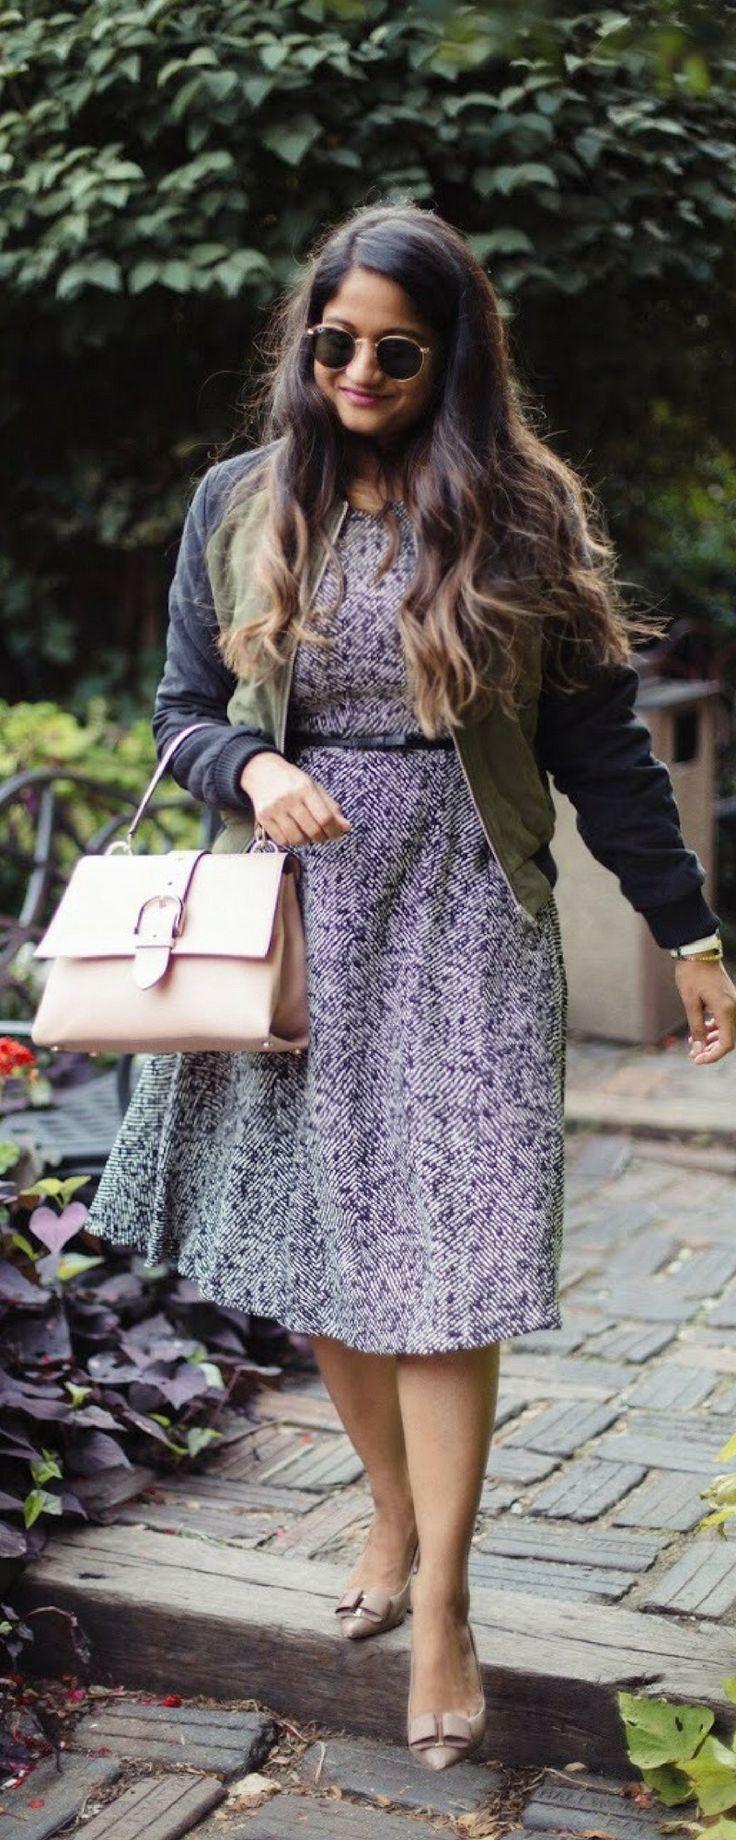 Le tote Rental Service review | dreamingloud.com  Philosophy dress, le tote, work wear outfit ideas, Ferragamo pumps, fall work wear dresses, fall style, Henri bender riverside satchel